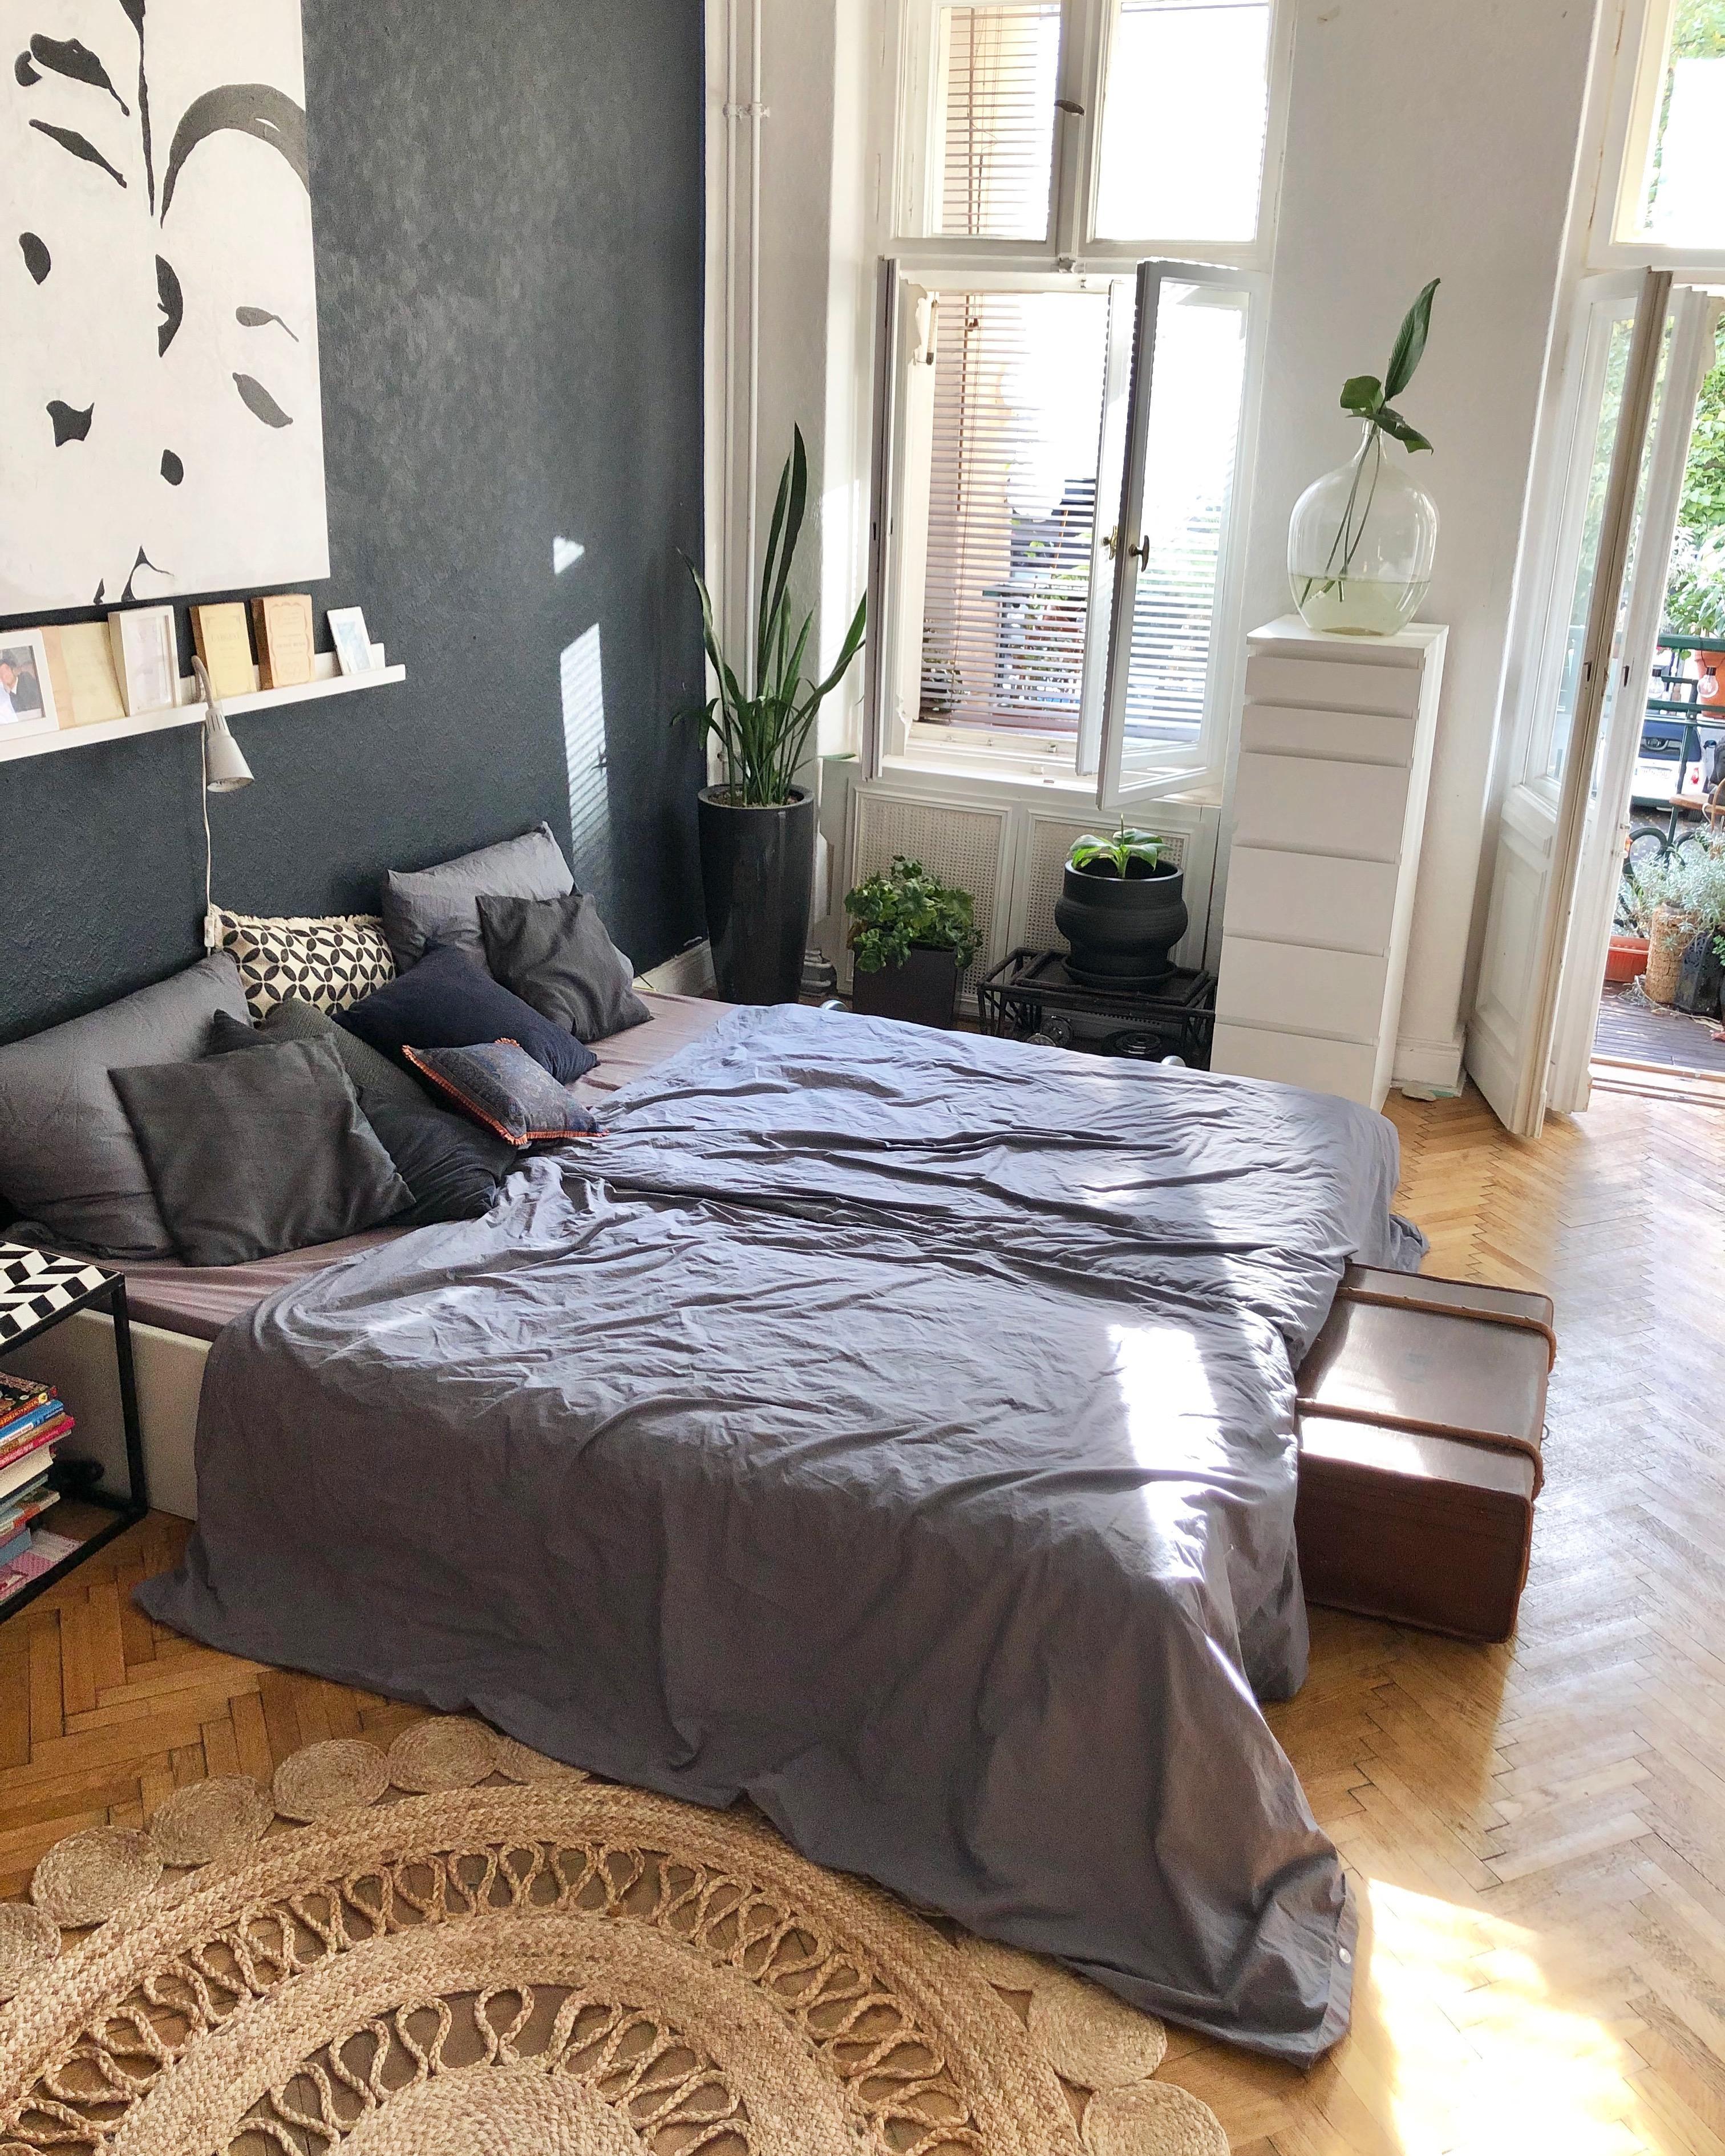 Schlafzimmer Altbau Bett Berlin Holzboden D